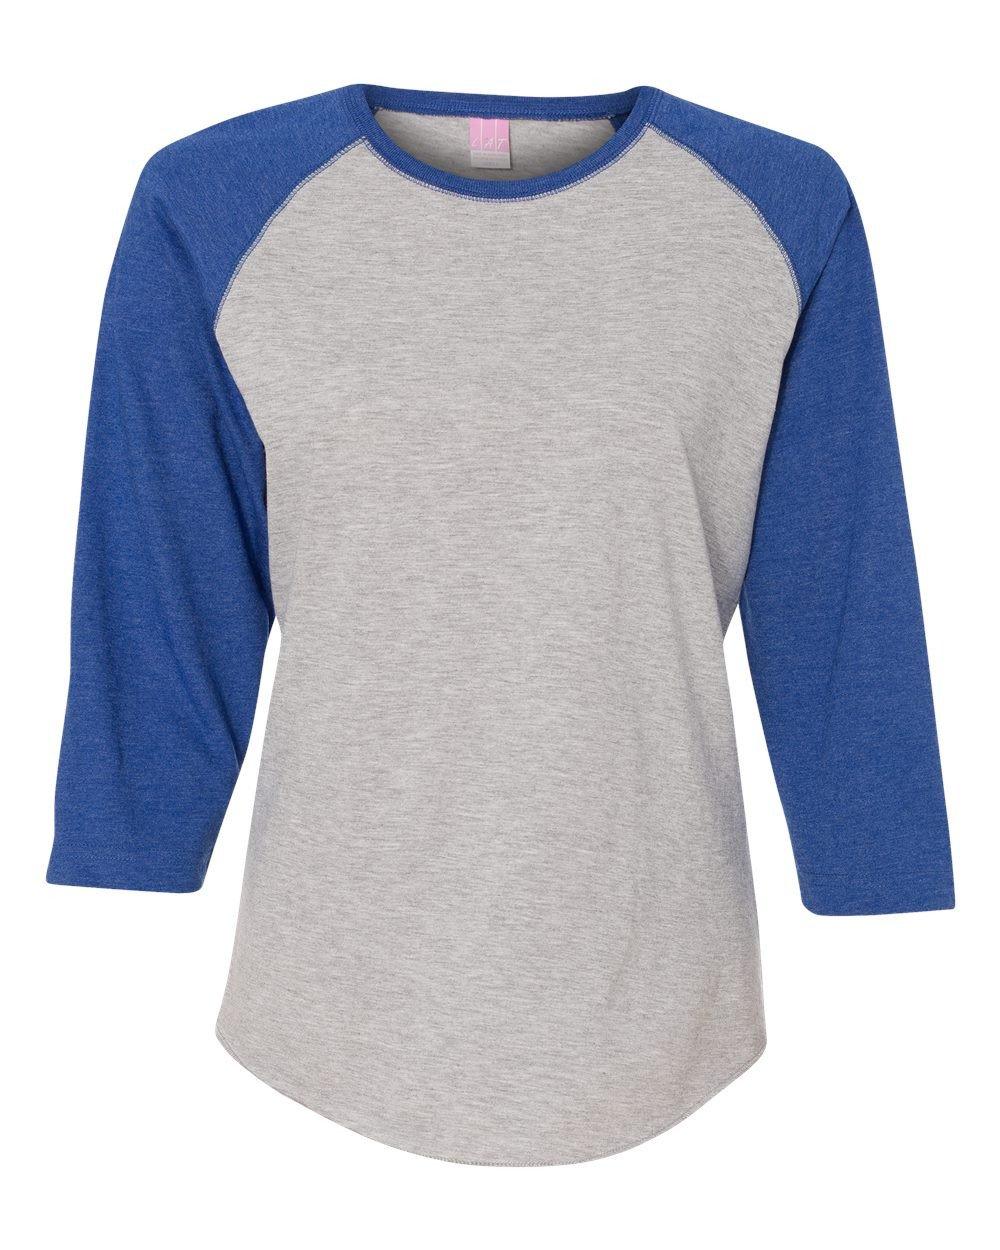 LAT-Ladies' Fine Jersey Baseball T-Shirt-3530-MD-Vntge Hthr- Vntge Royal